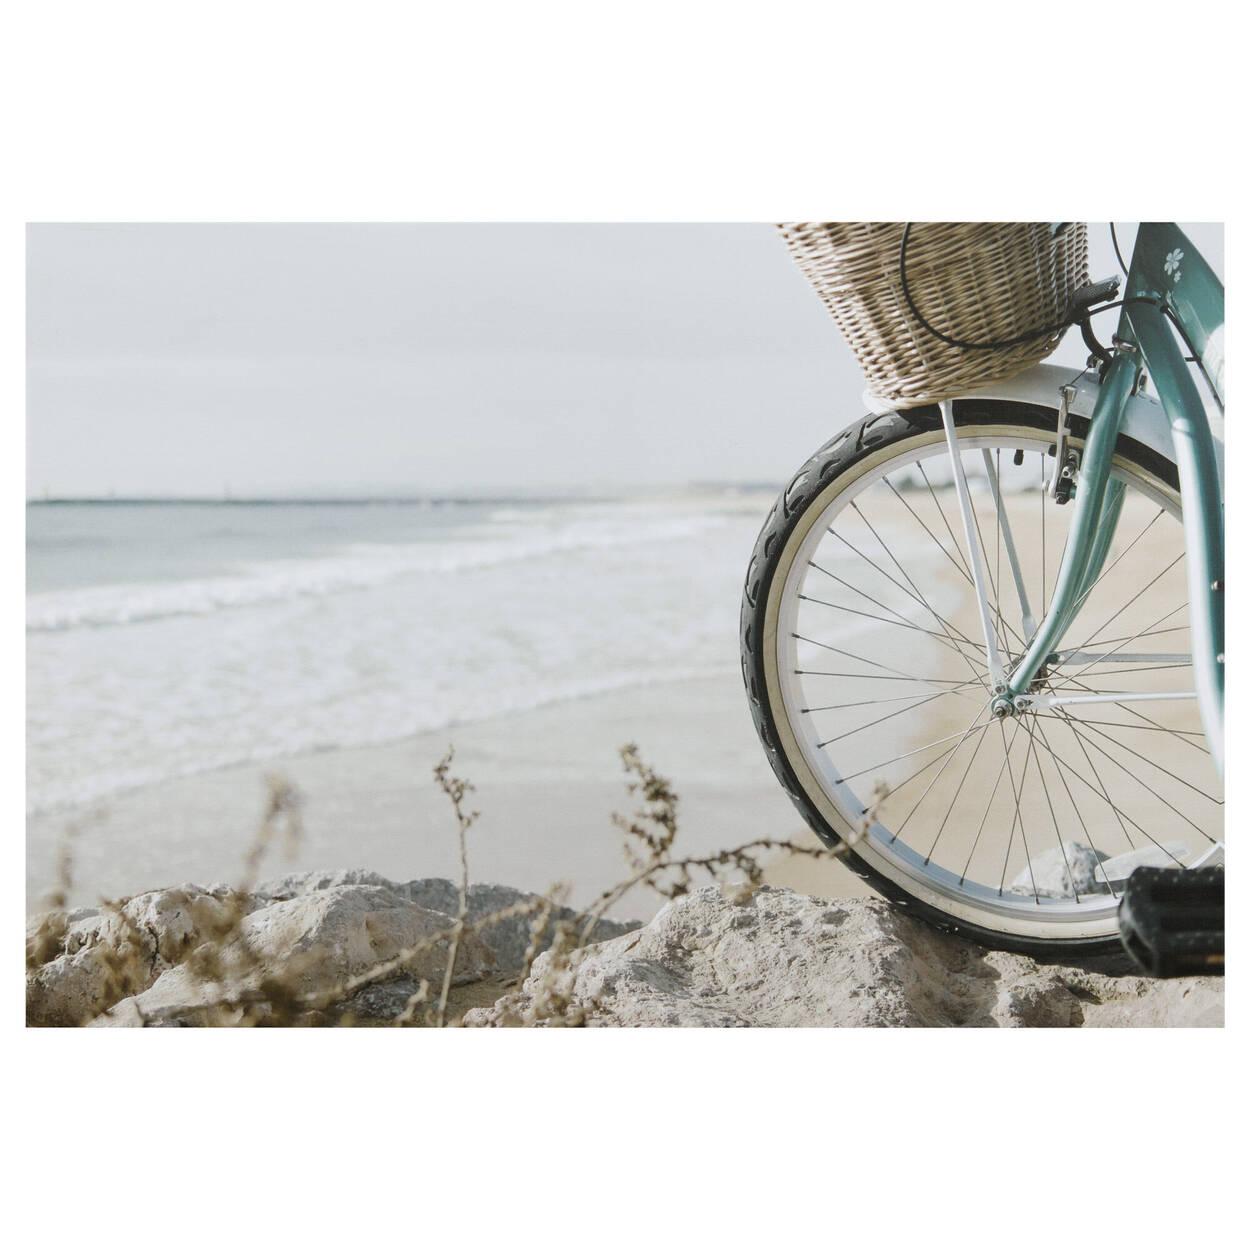 Bike on the Beach Printed Canvas